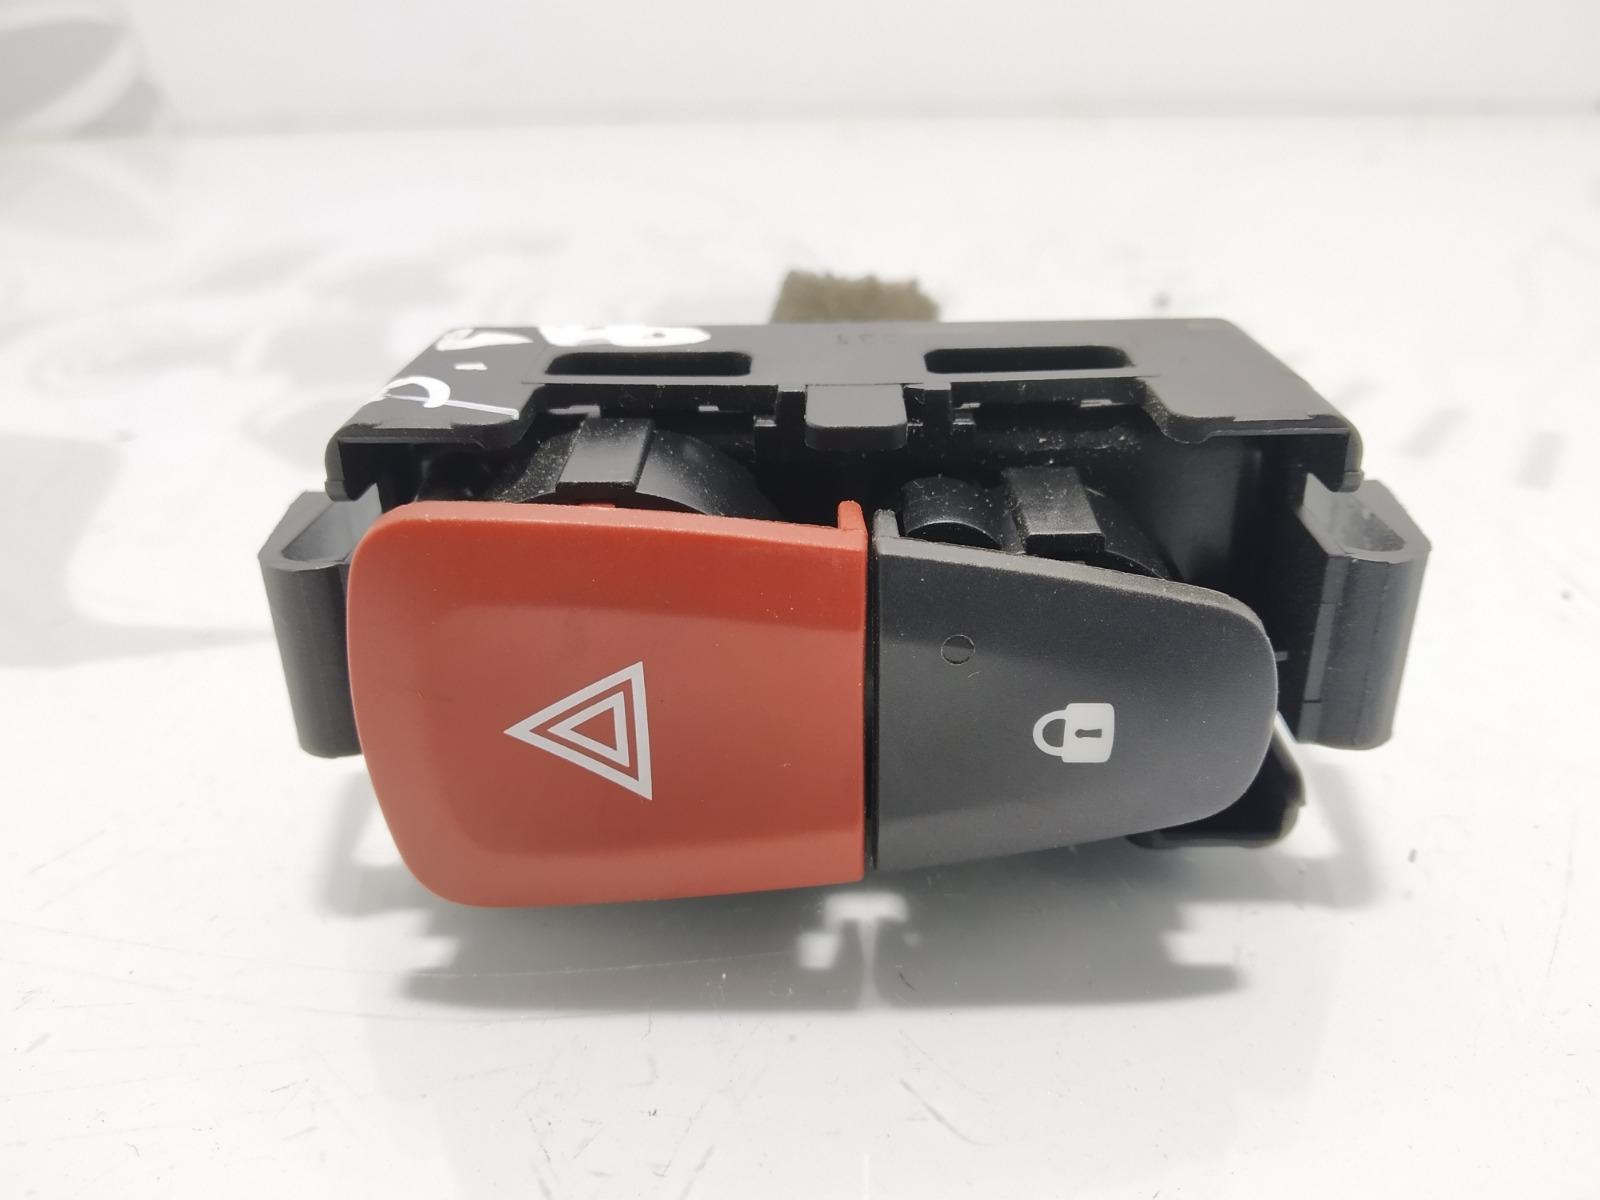 Кнопка аварийной сигнализации Renault Grand Scenic 1.6 I 2011 (б/у)